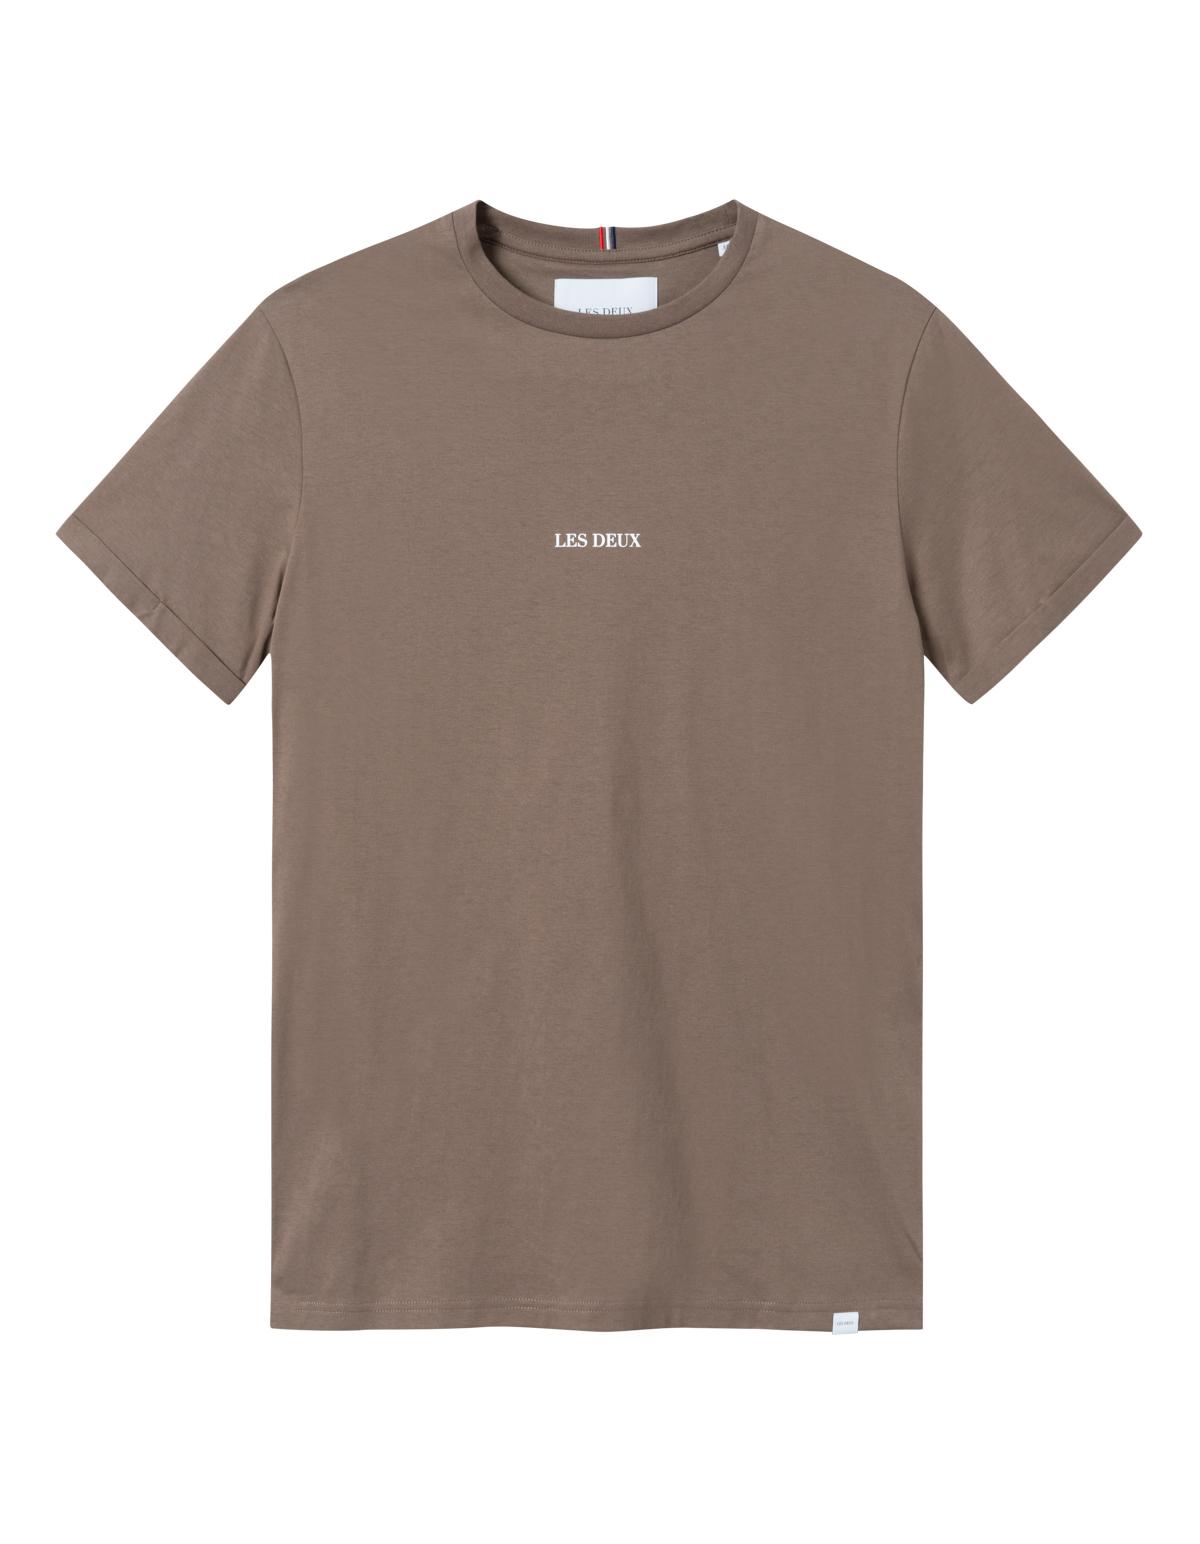 Les Deux Lens t-shirt, mountain grey/white, small